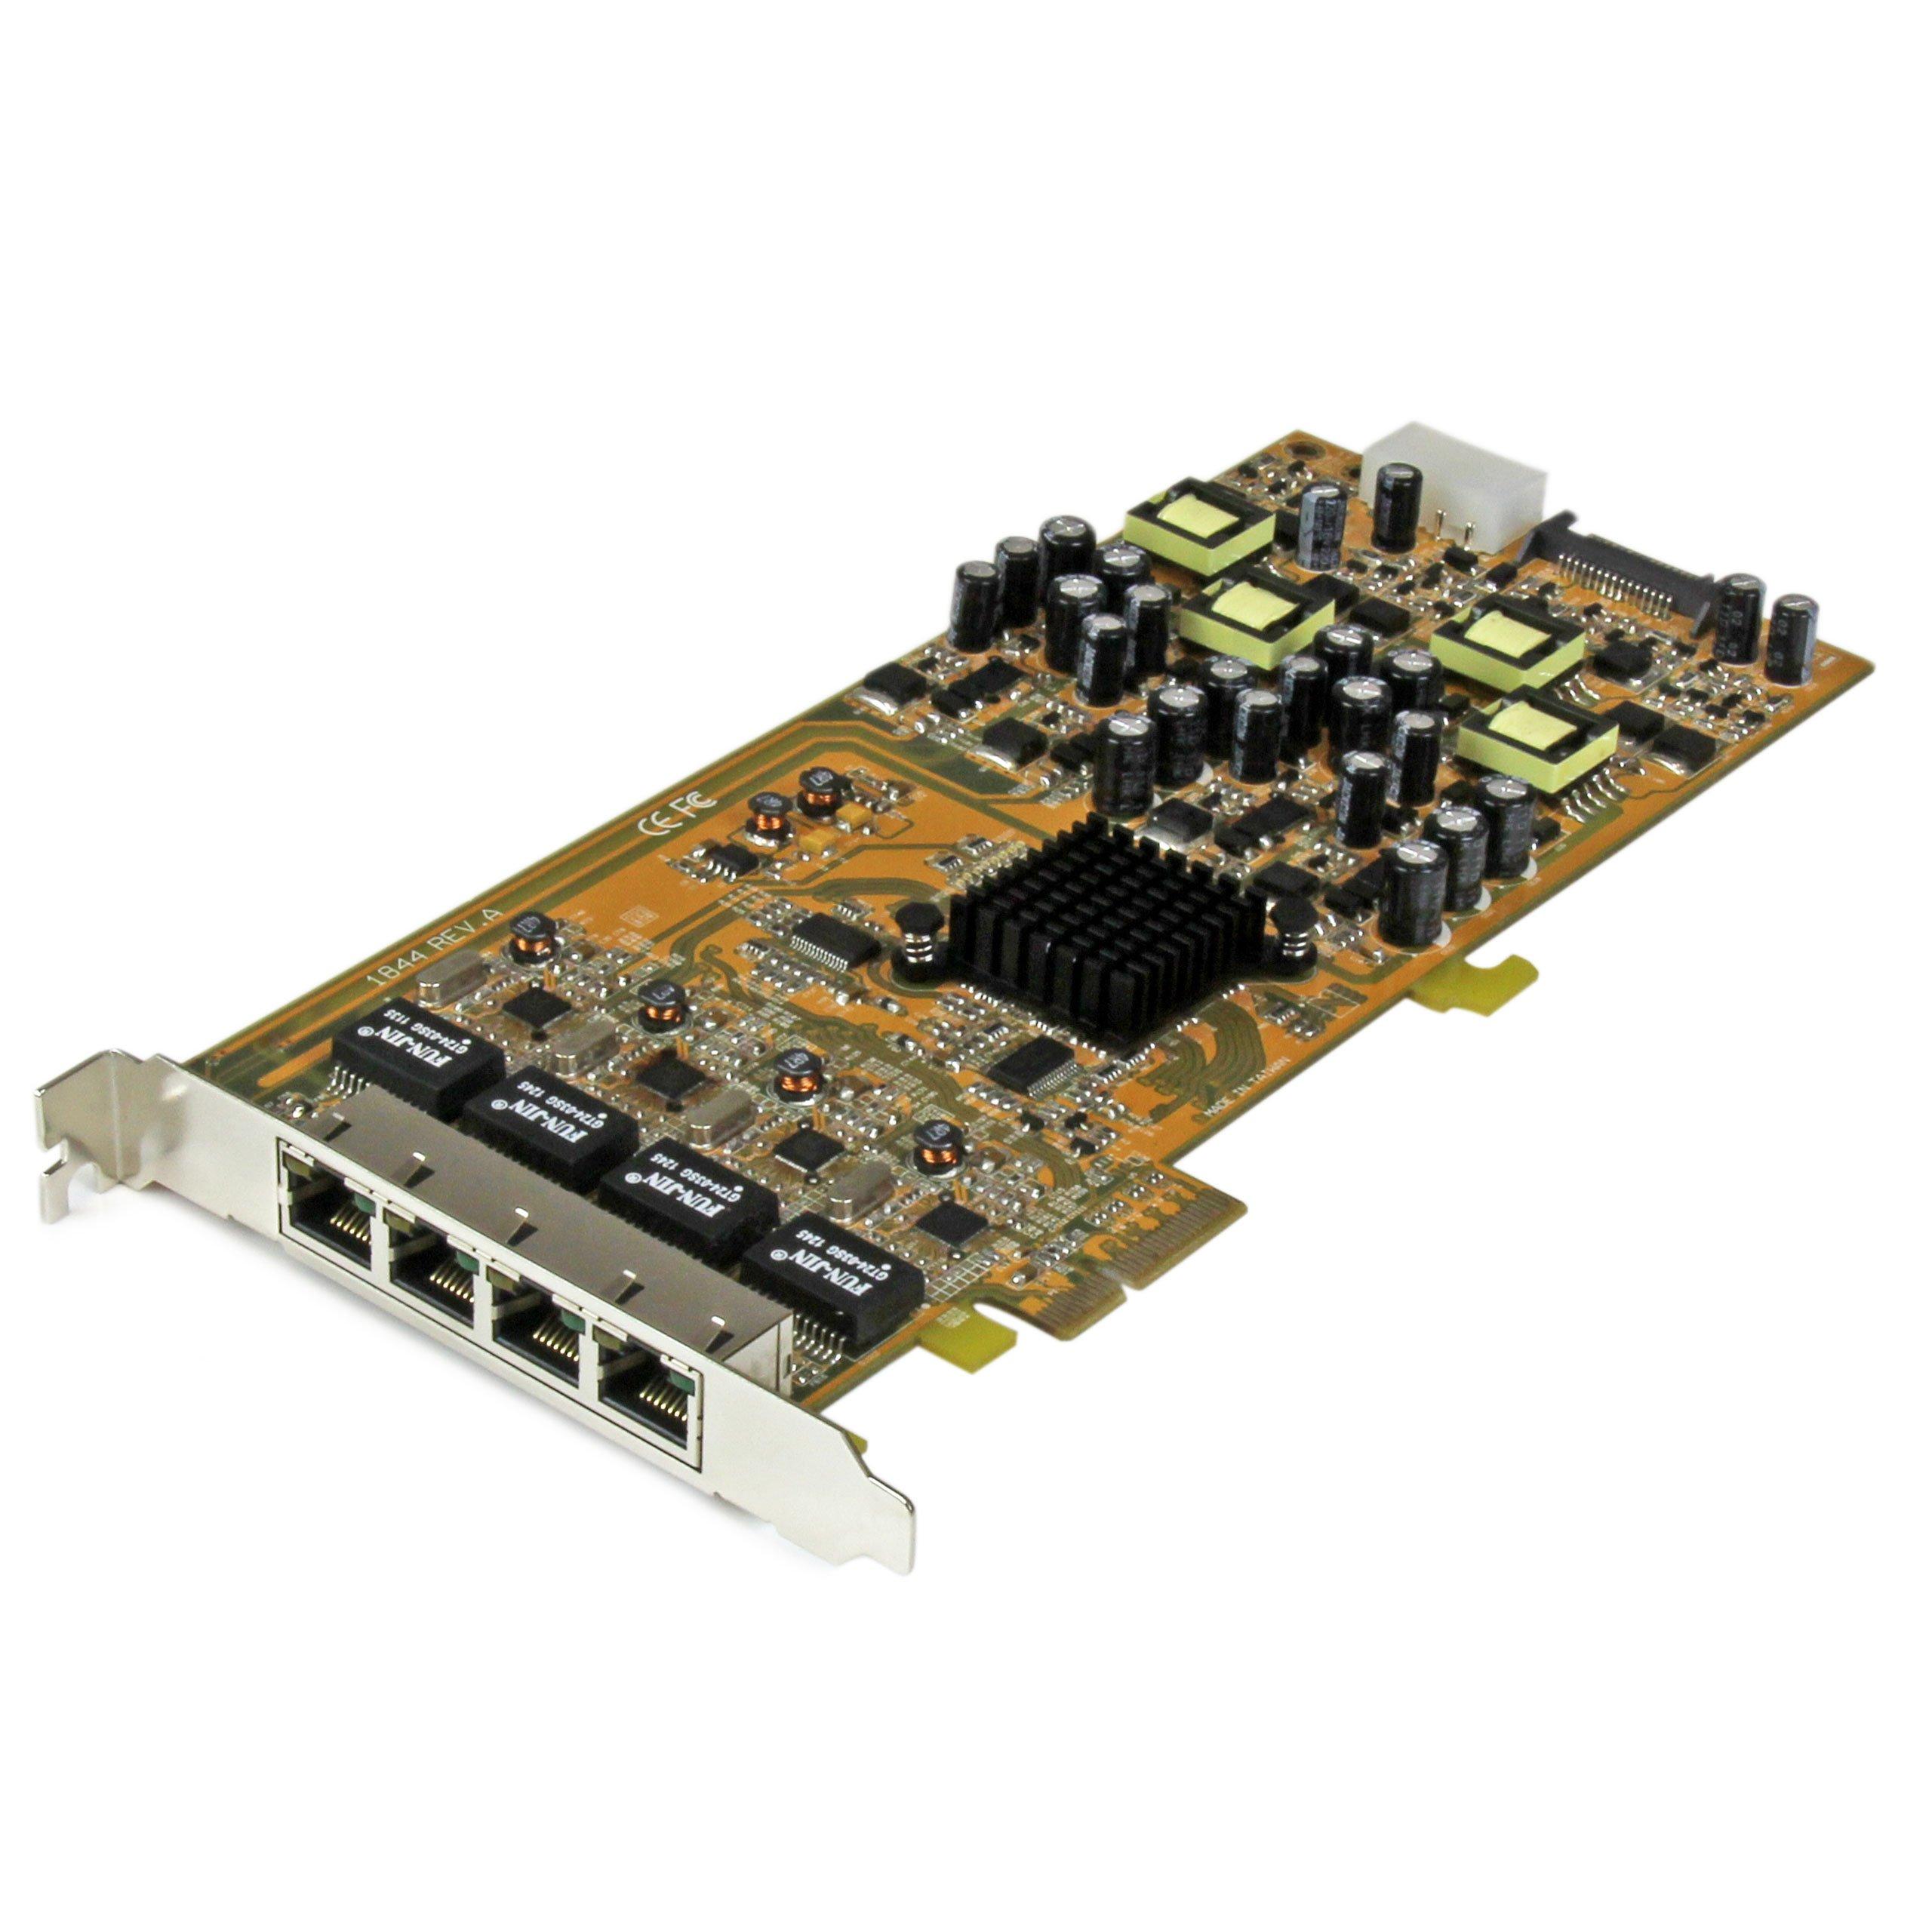 StarTech.com 4 Port Gigabit Power Ethernet PCIe Network Card - PSE / PoE PCI Express NIC (ST4000PEXPSE)